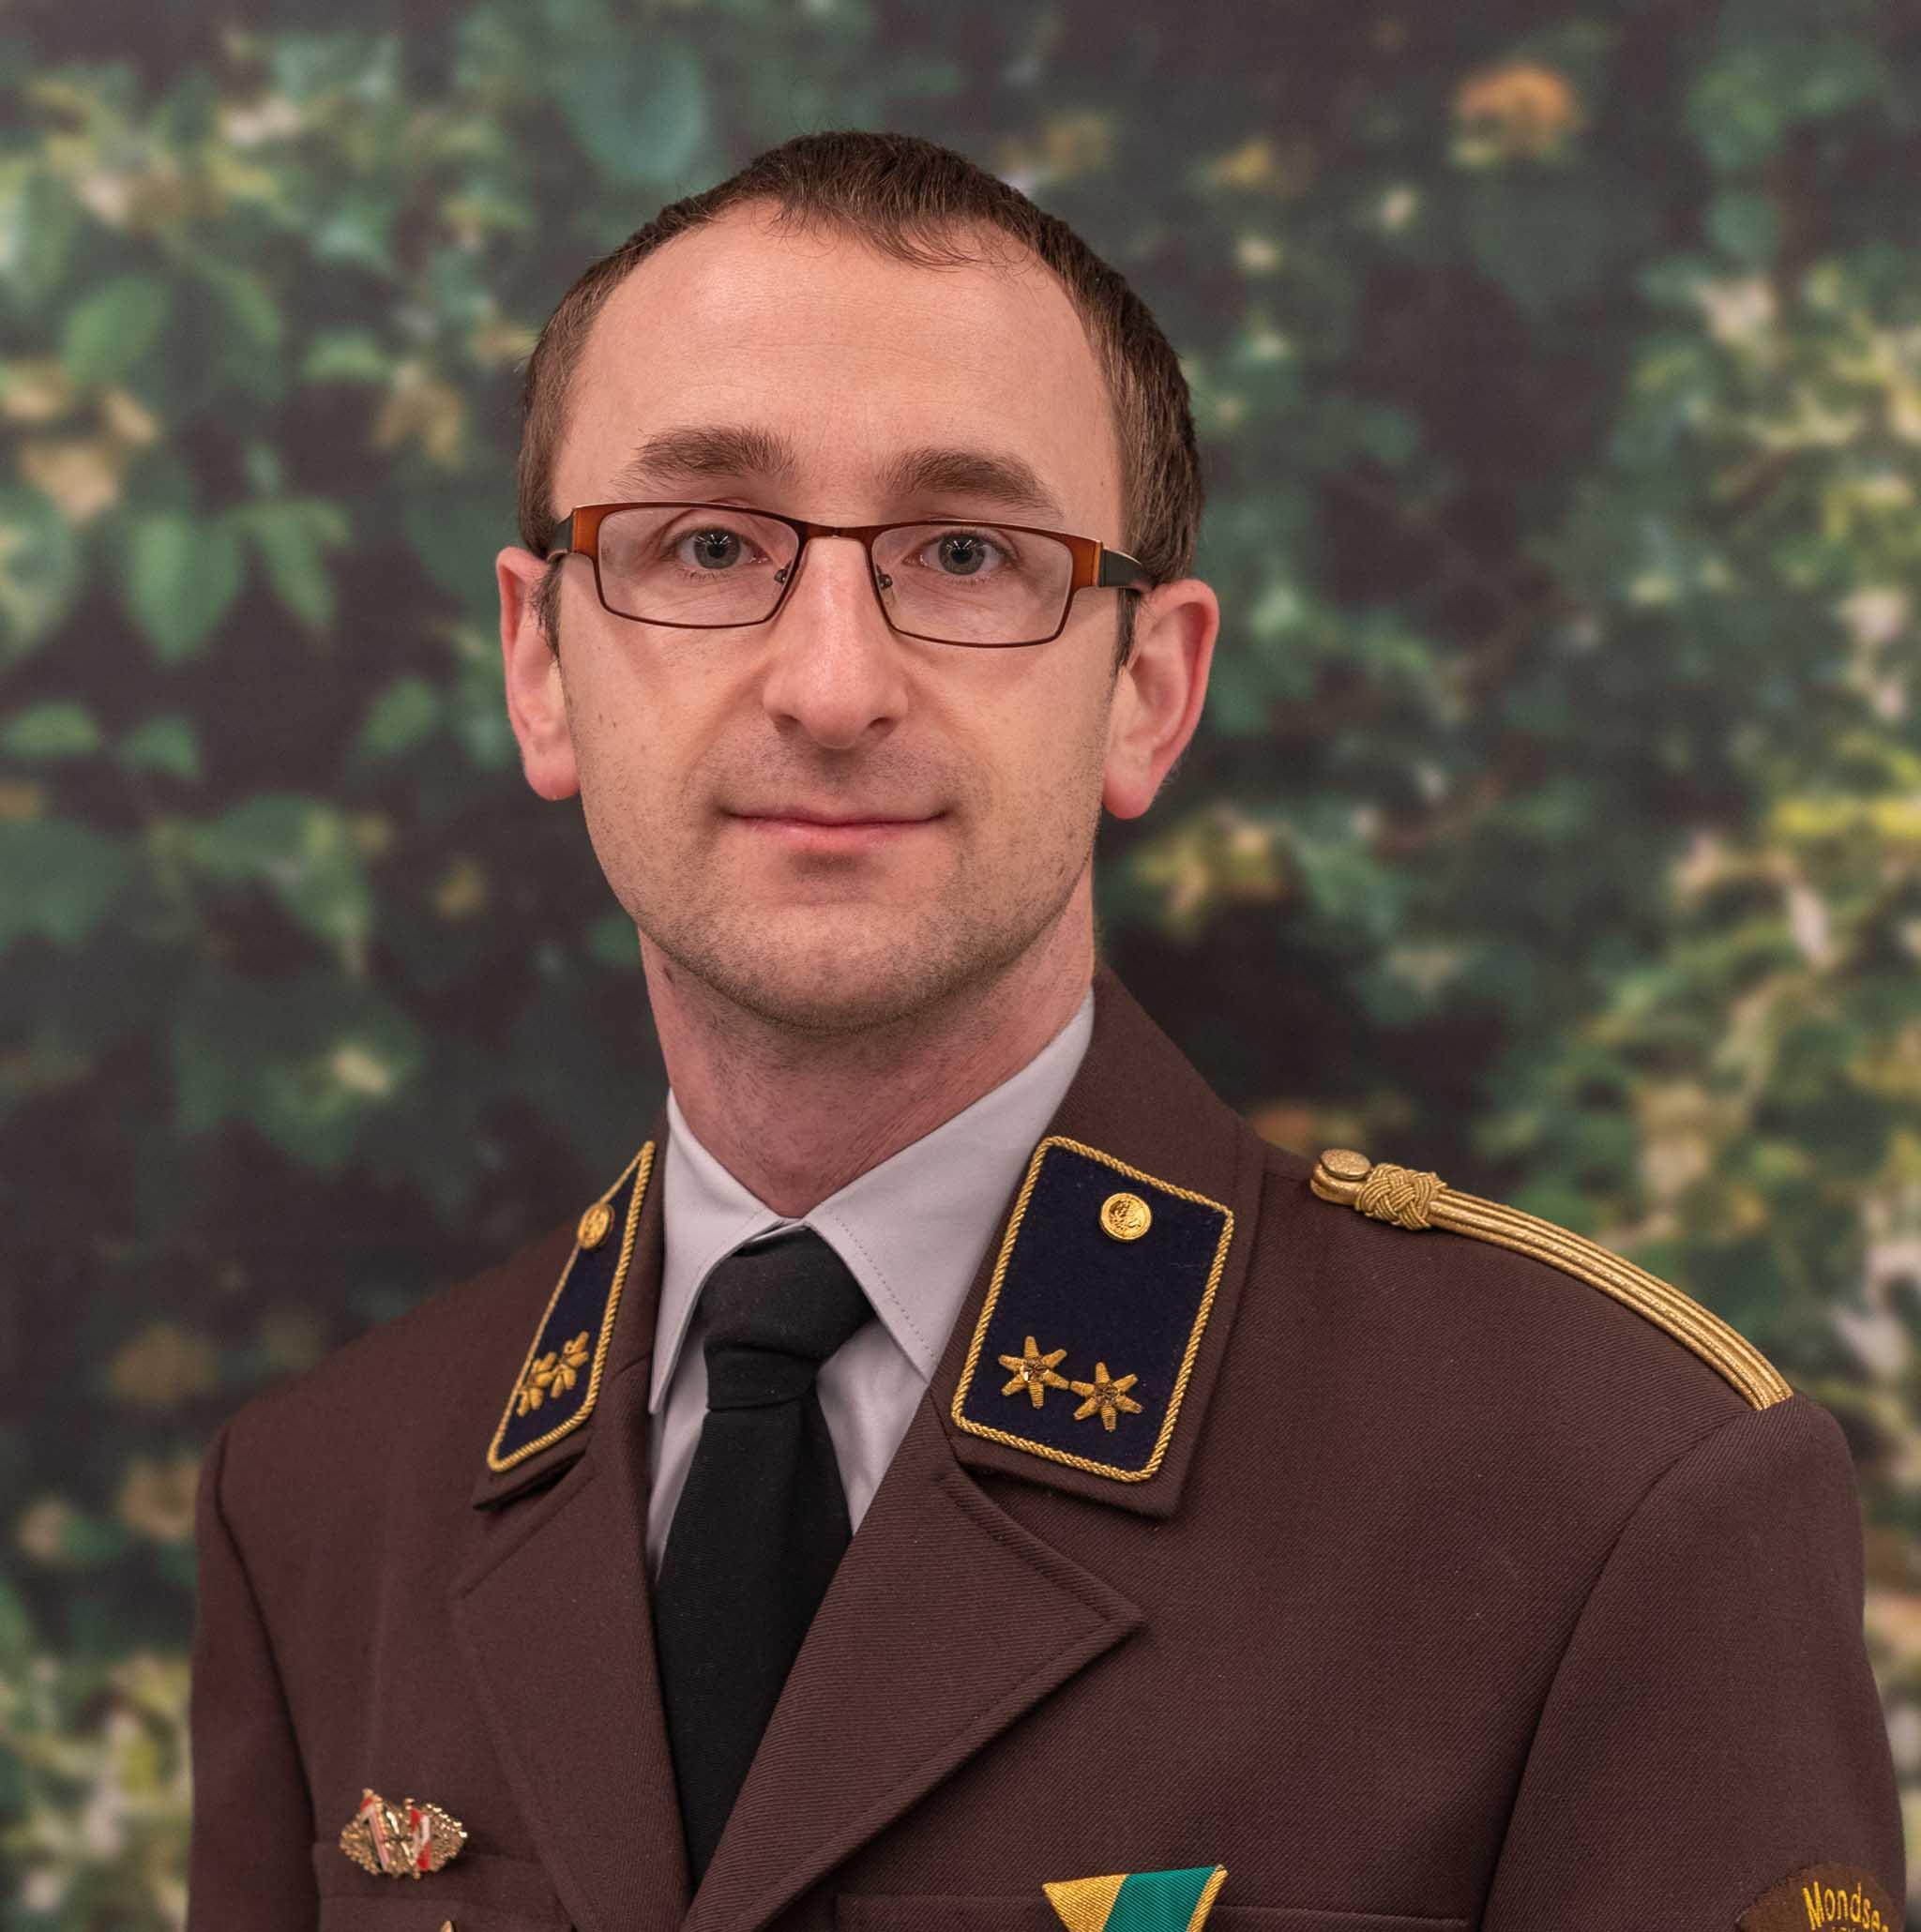 OAW Johannes Dorfinger